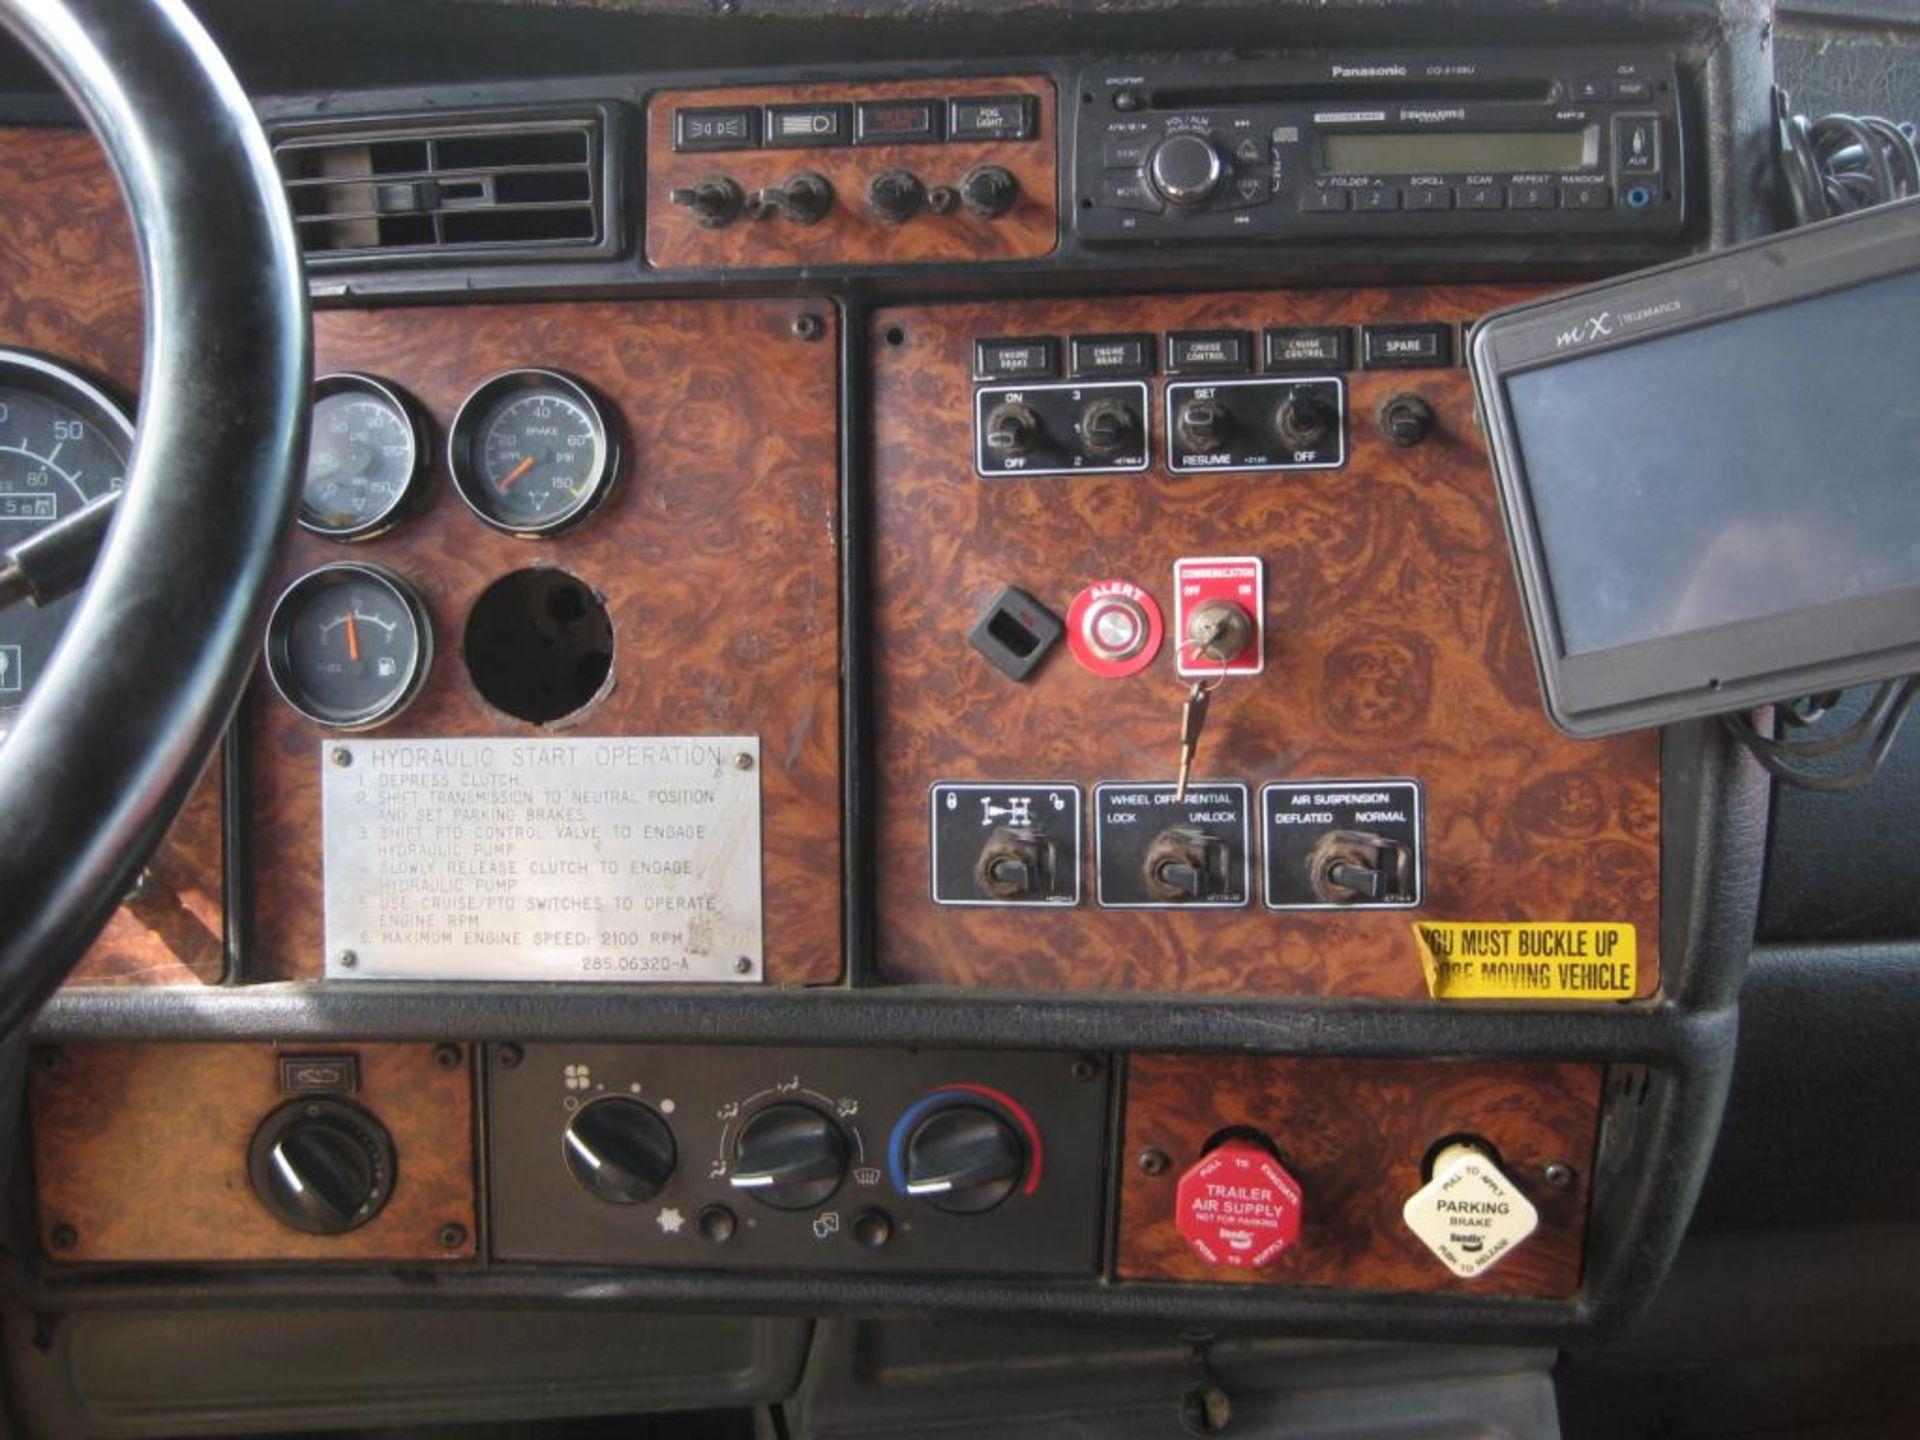 Kenworth Truck - Image 14 of 20